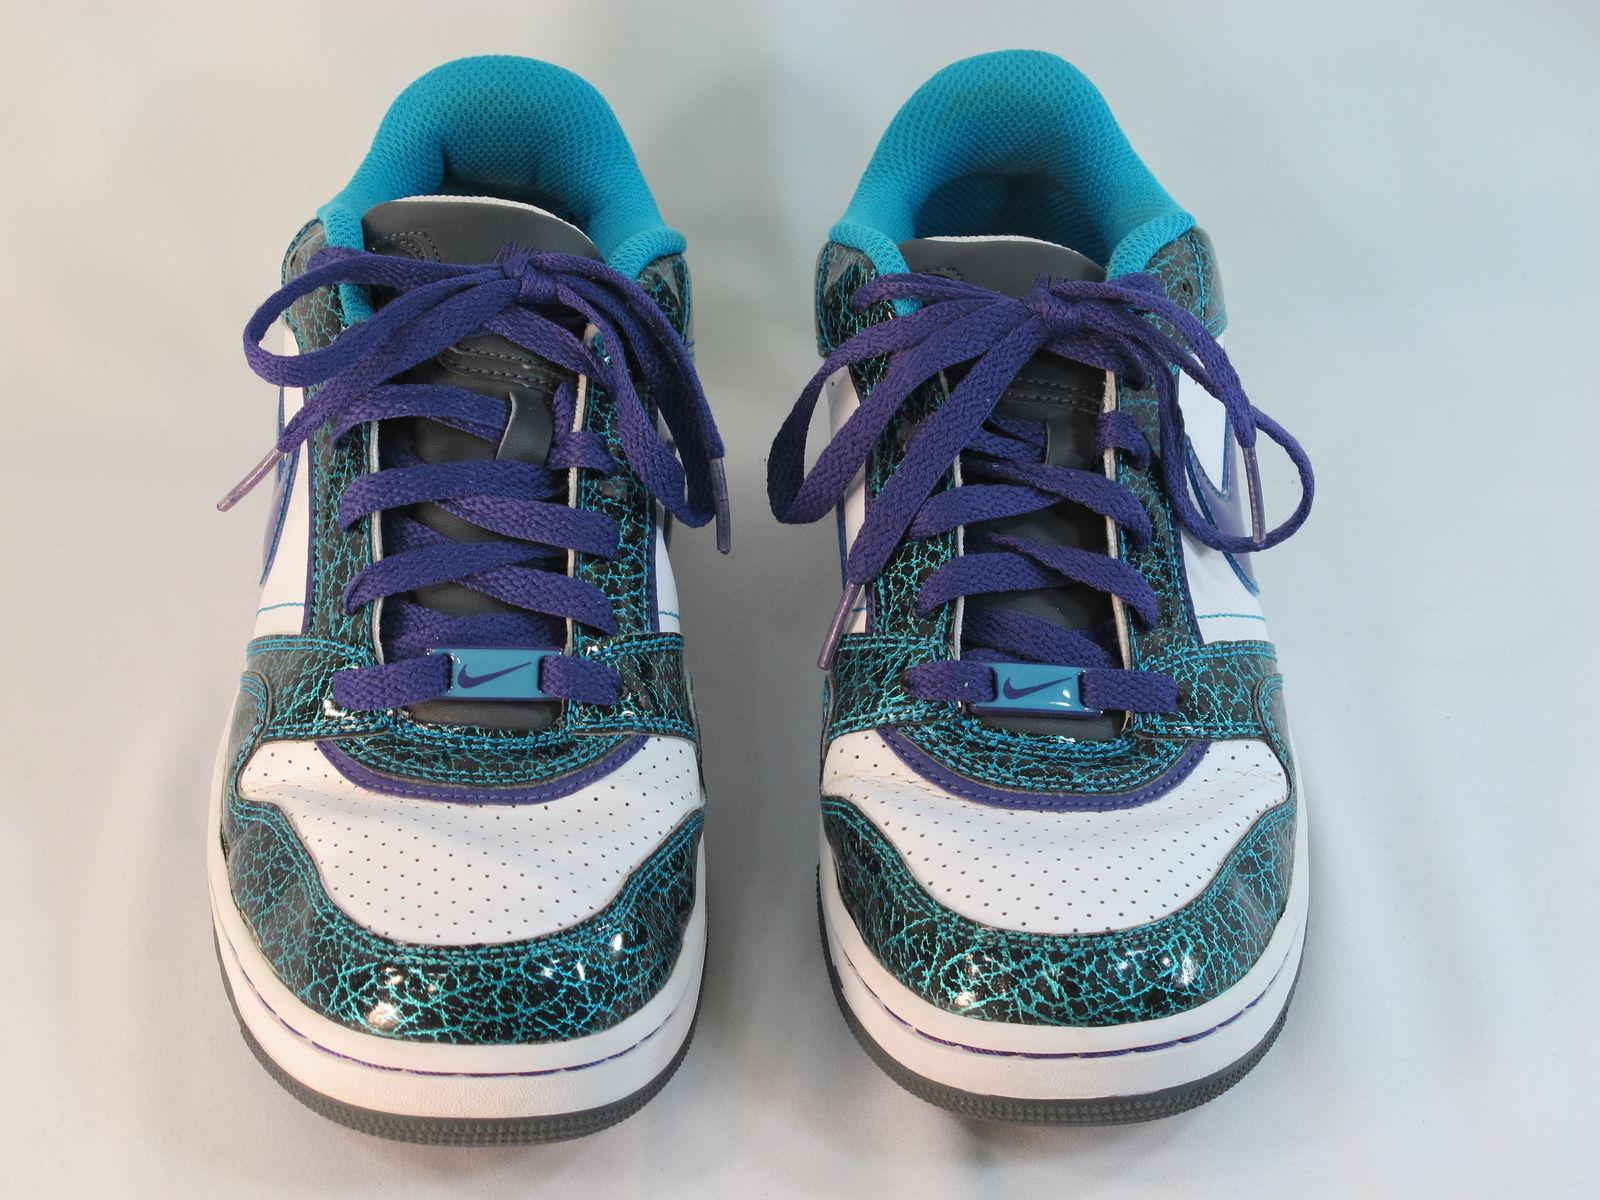 separation shoes fe8cc 42bfa Nike Air Prestige 3 Low Skater Athletic Shoes Women s 8.5 US Near Mint  Condition